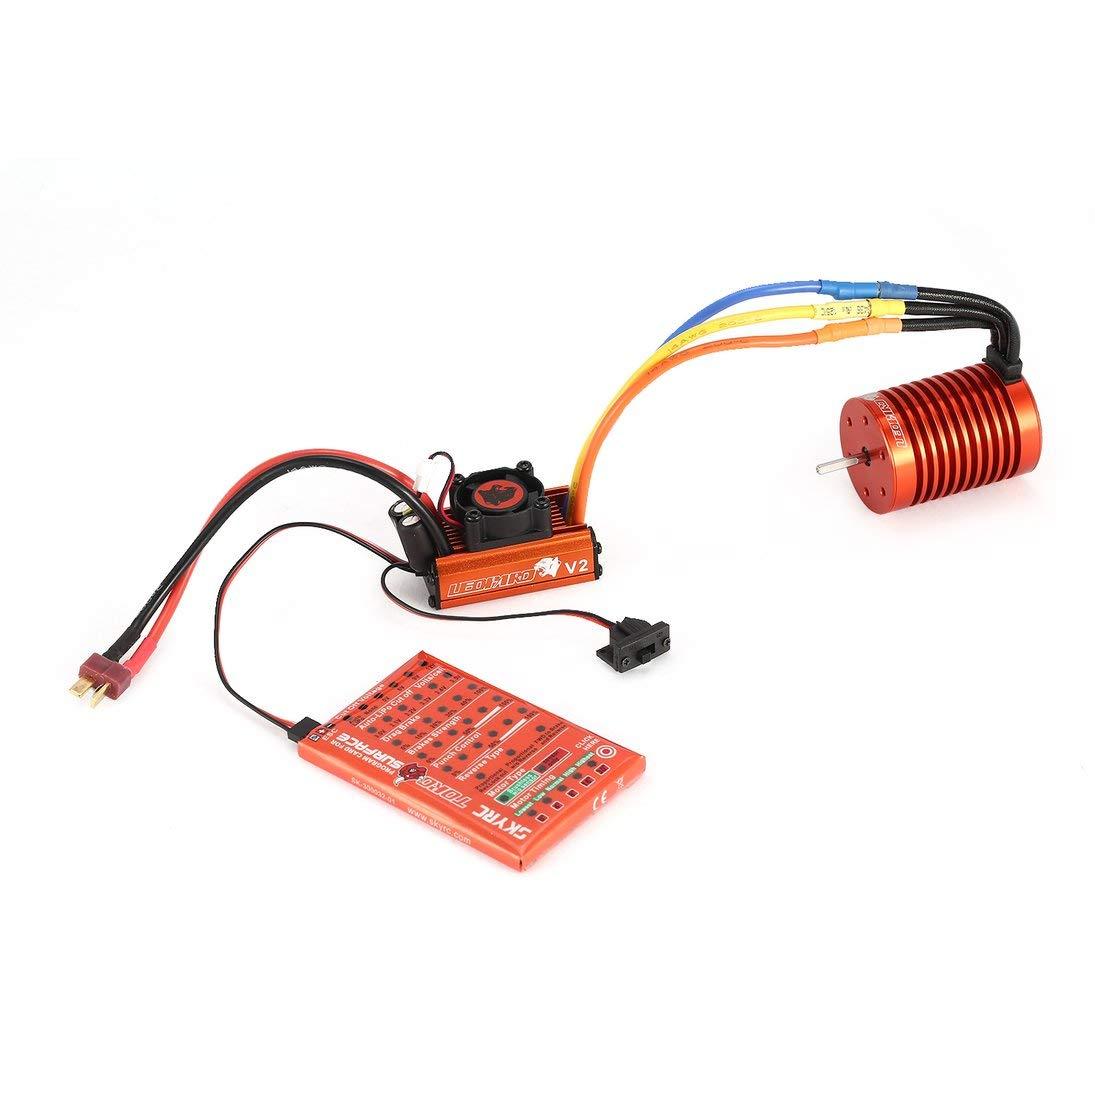 ToGames-ES SKYRC 9T 4370KV Brushless Motor 60A ESC Programming Card Kit for 1/10 RC Car